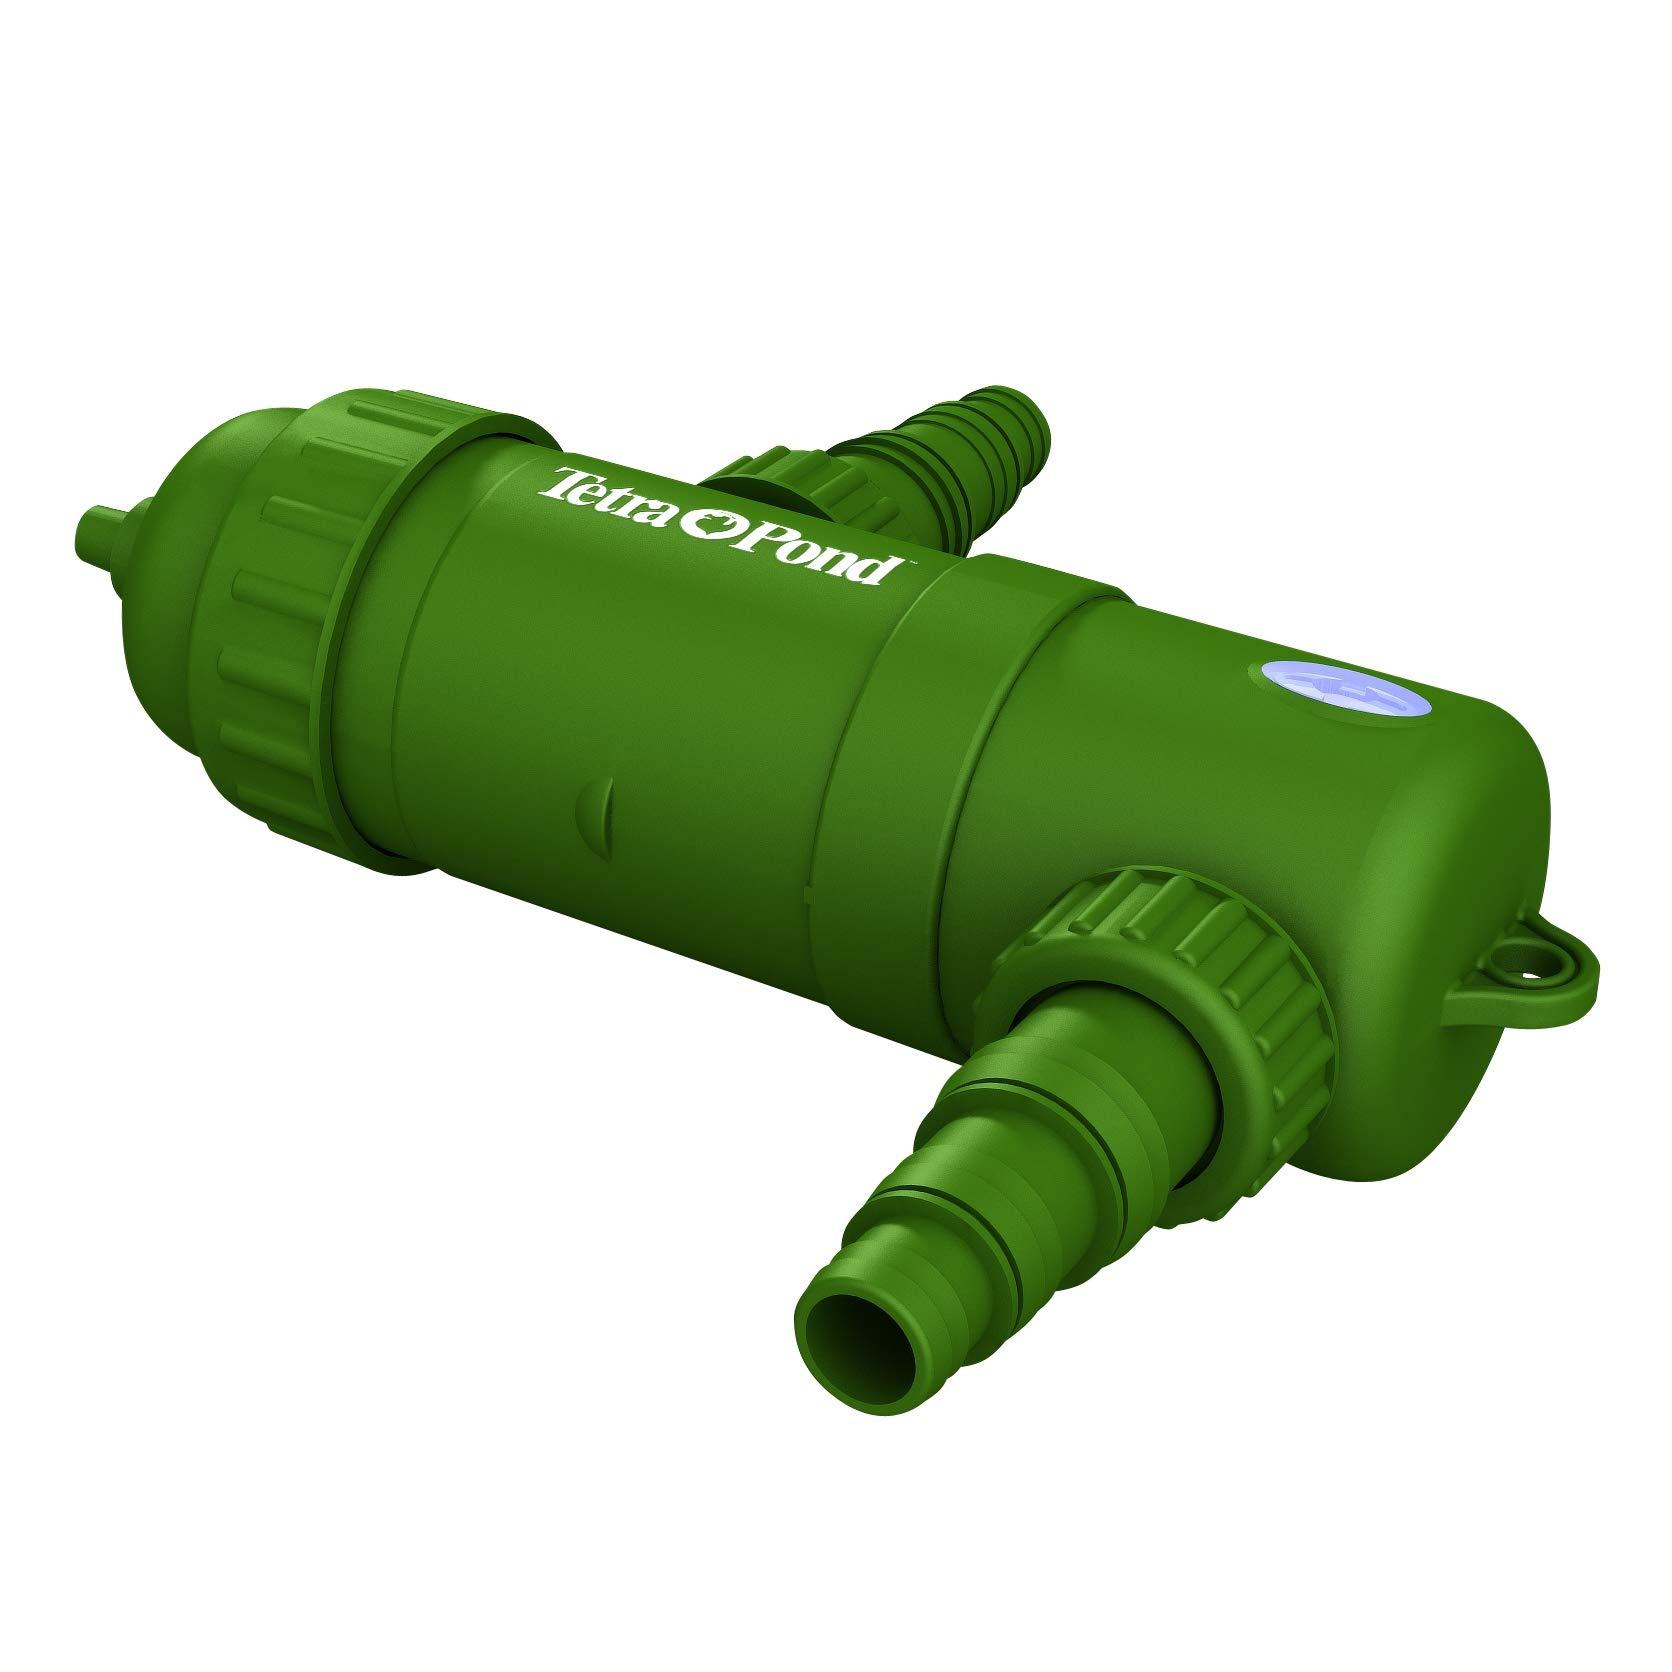 TetraPond UVC-5 GreenFree UV Clarifiers For Up To 660 Gallons, 5-Watt by Tetra Pond